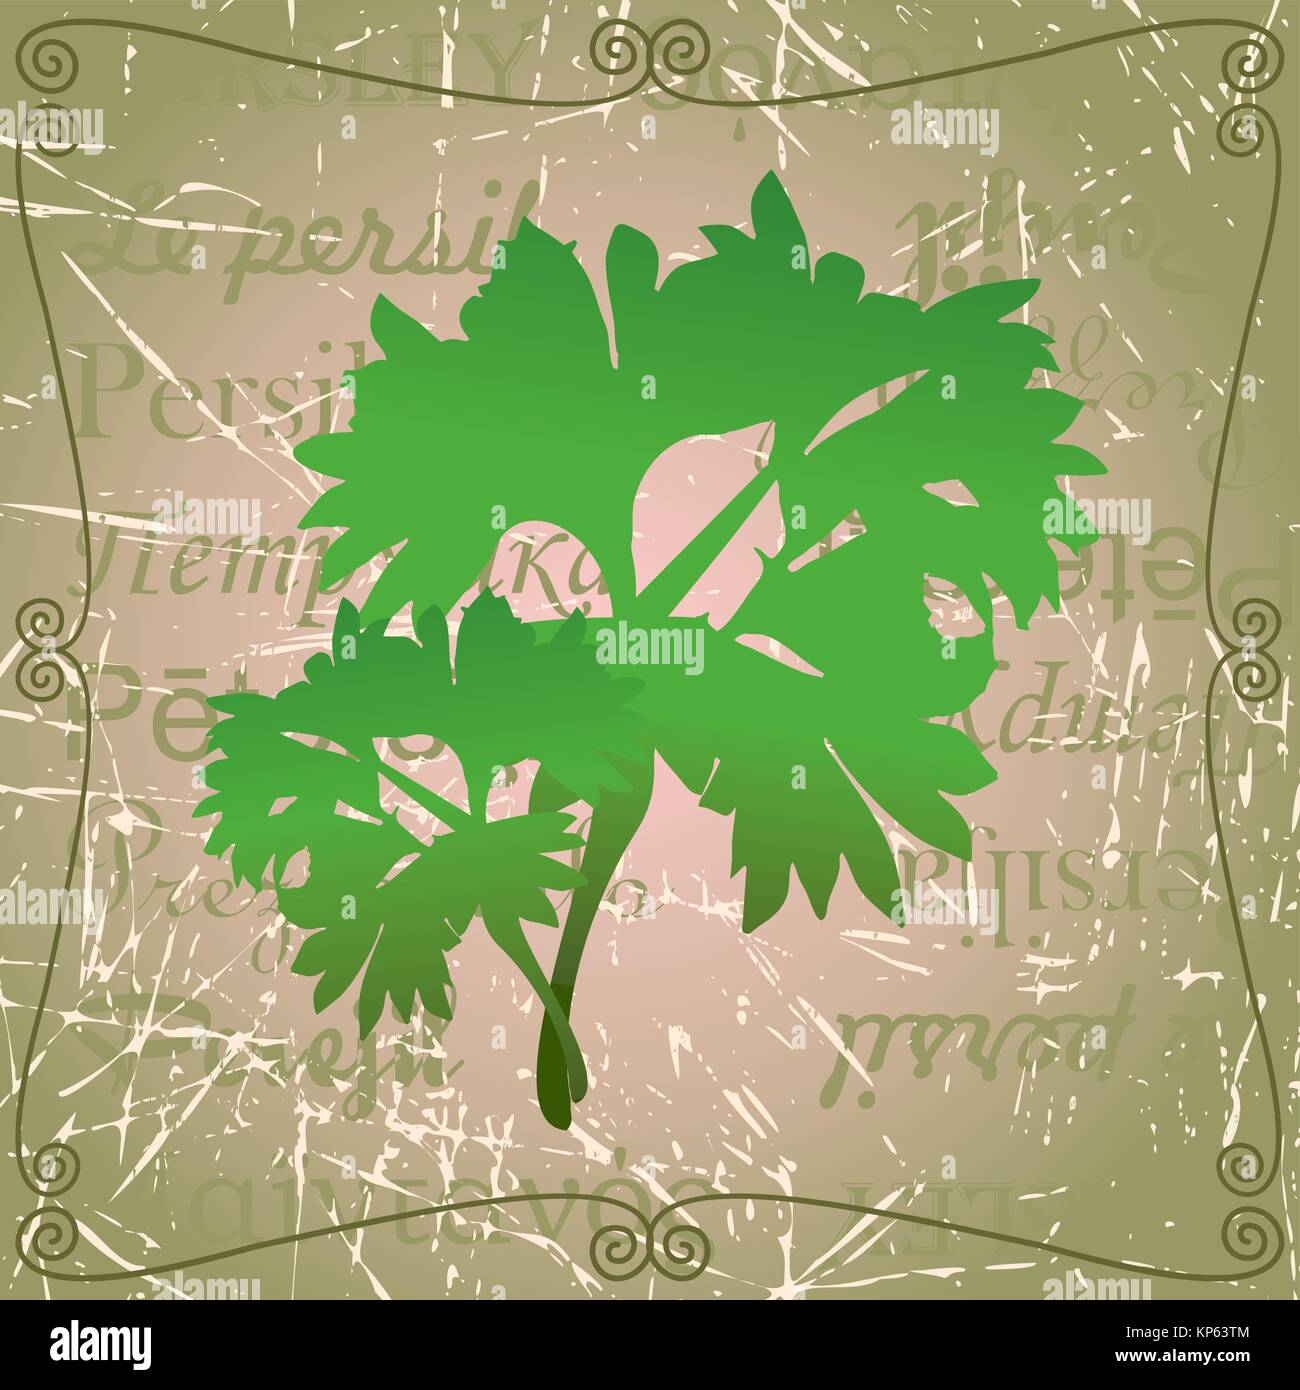 Sprig of parsley - Stock Vector